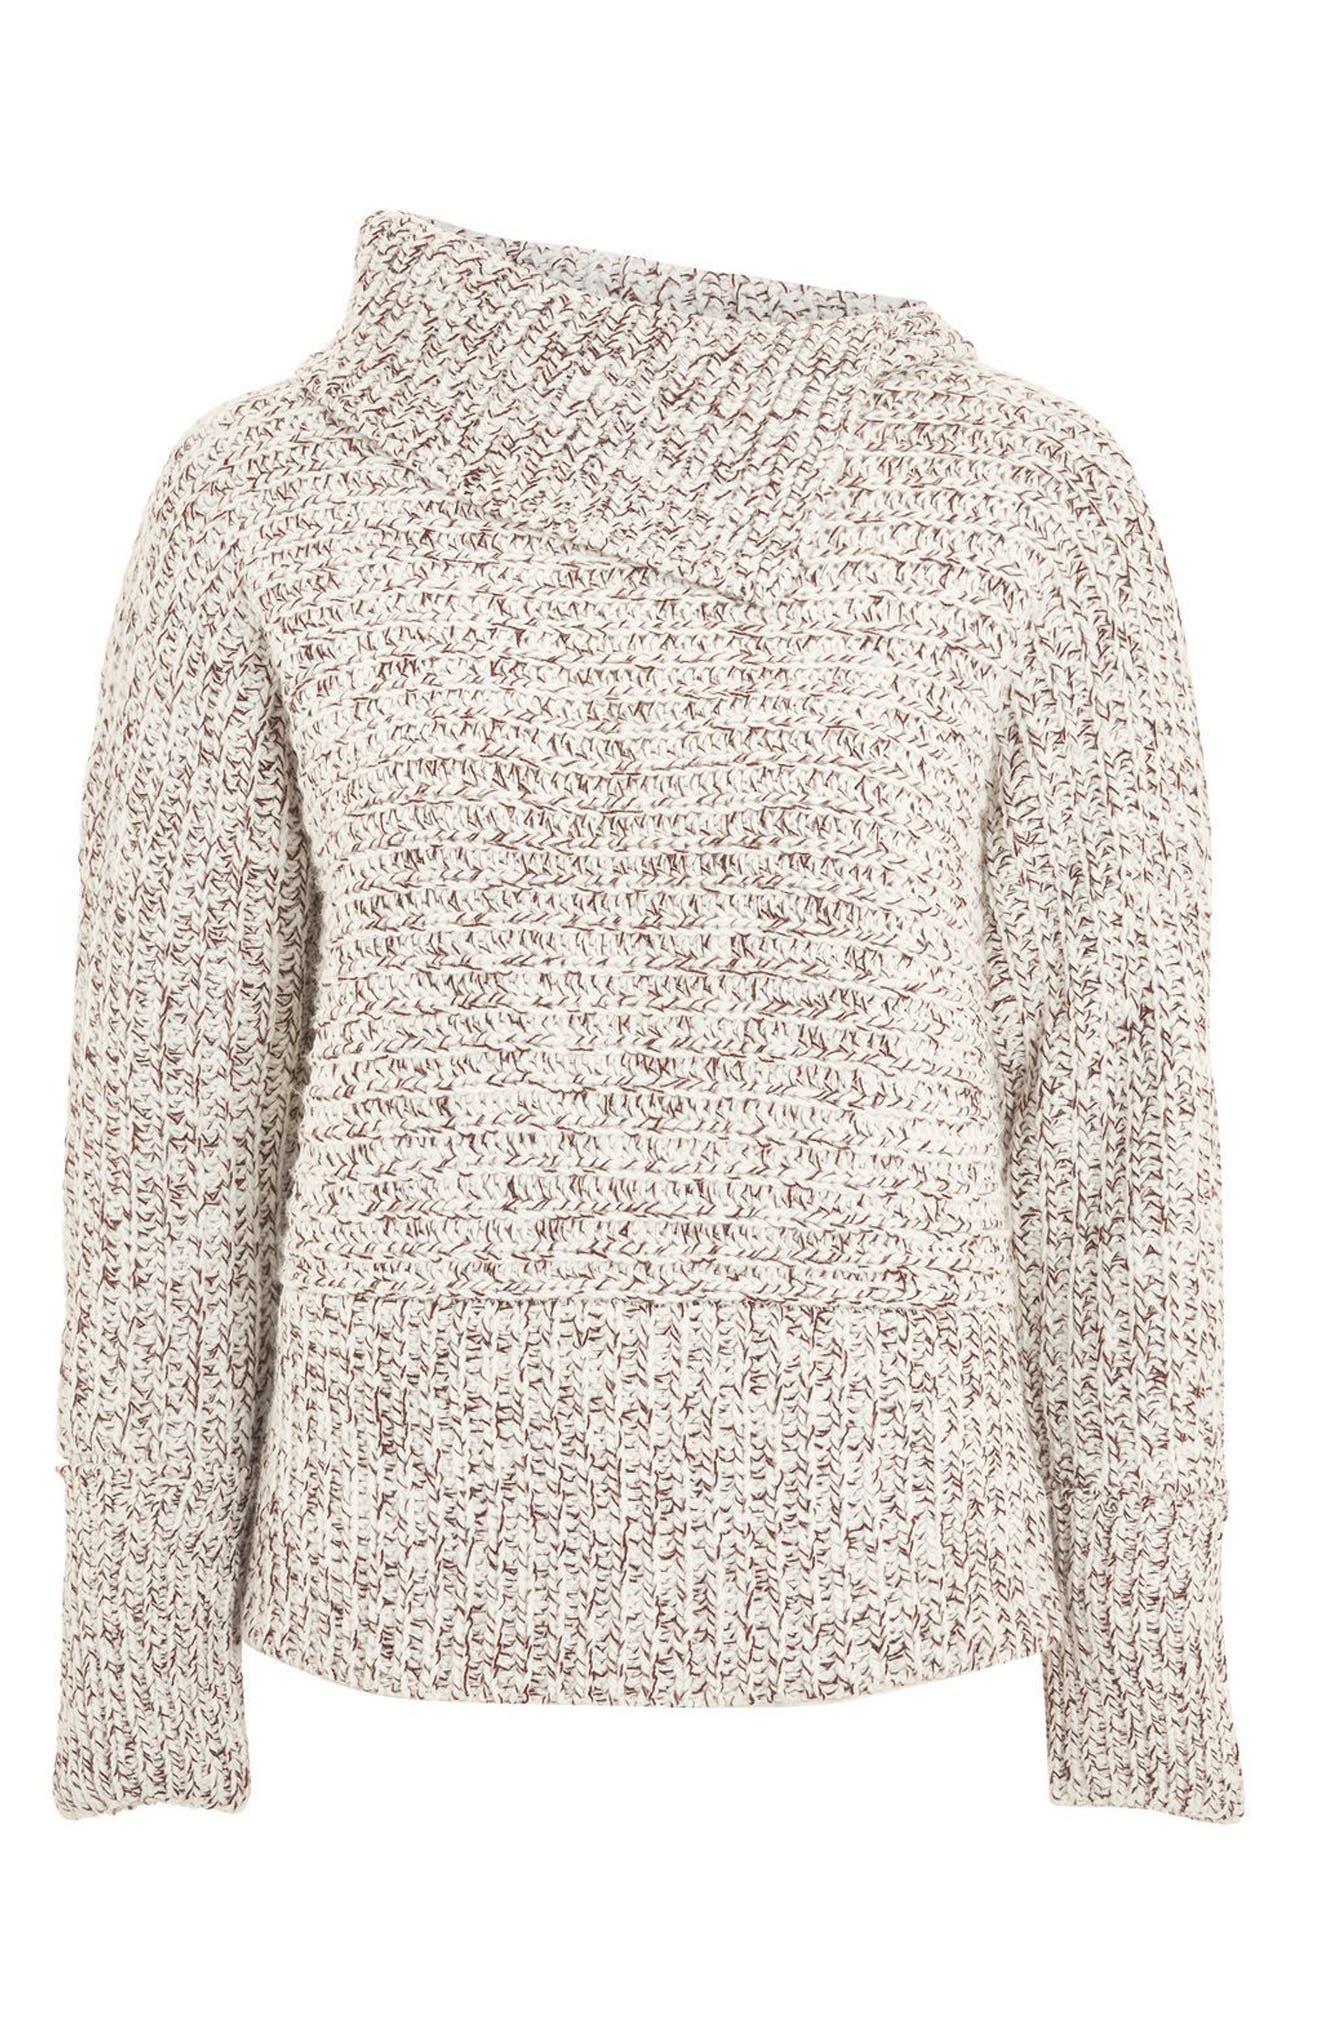 Tweedy Envelope Neck Sweater,                             Alternate thumbnail 3, color,                             600